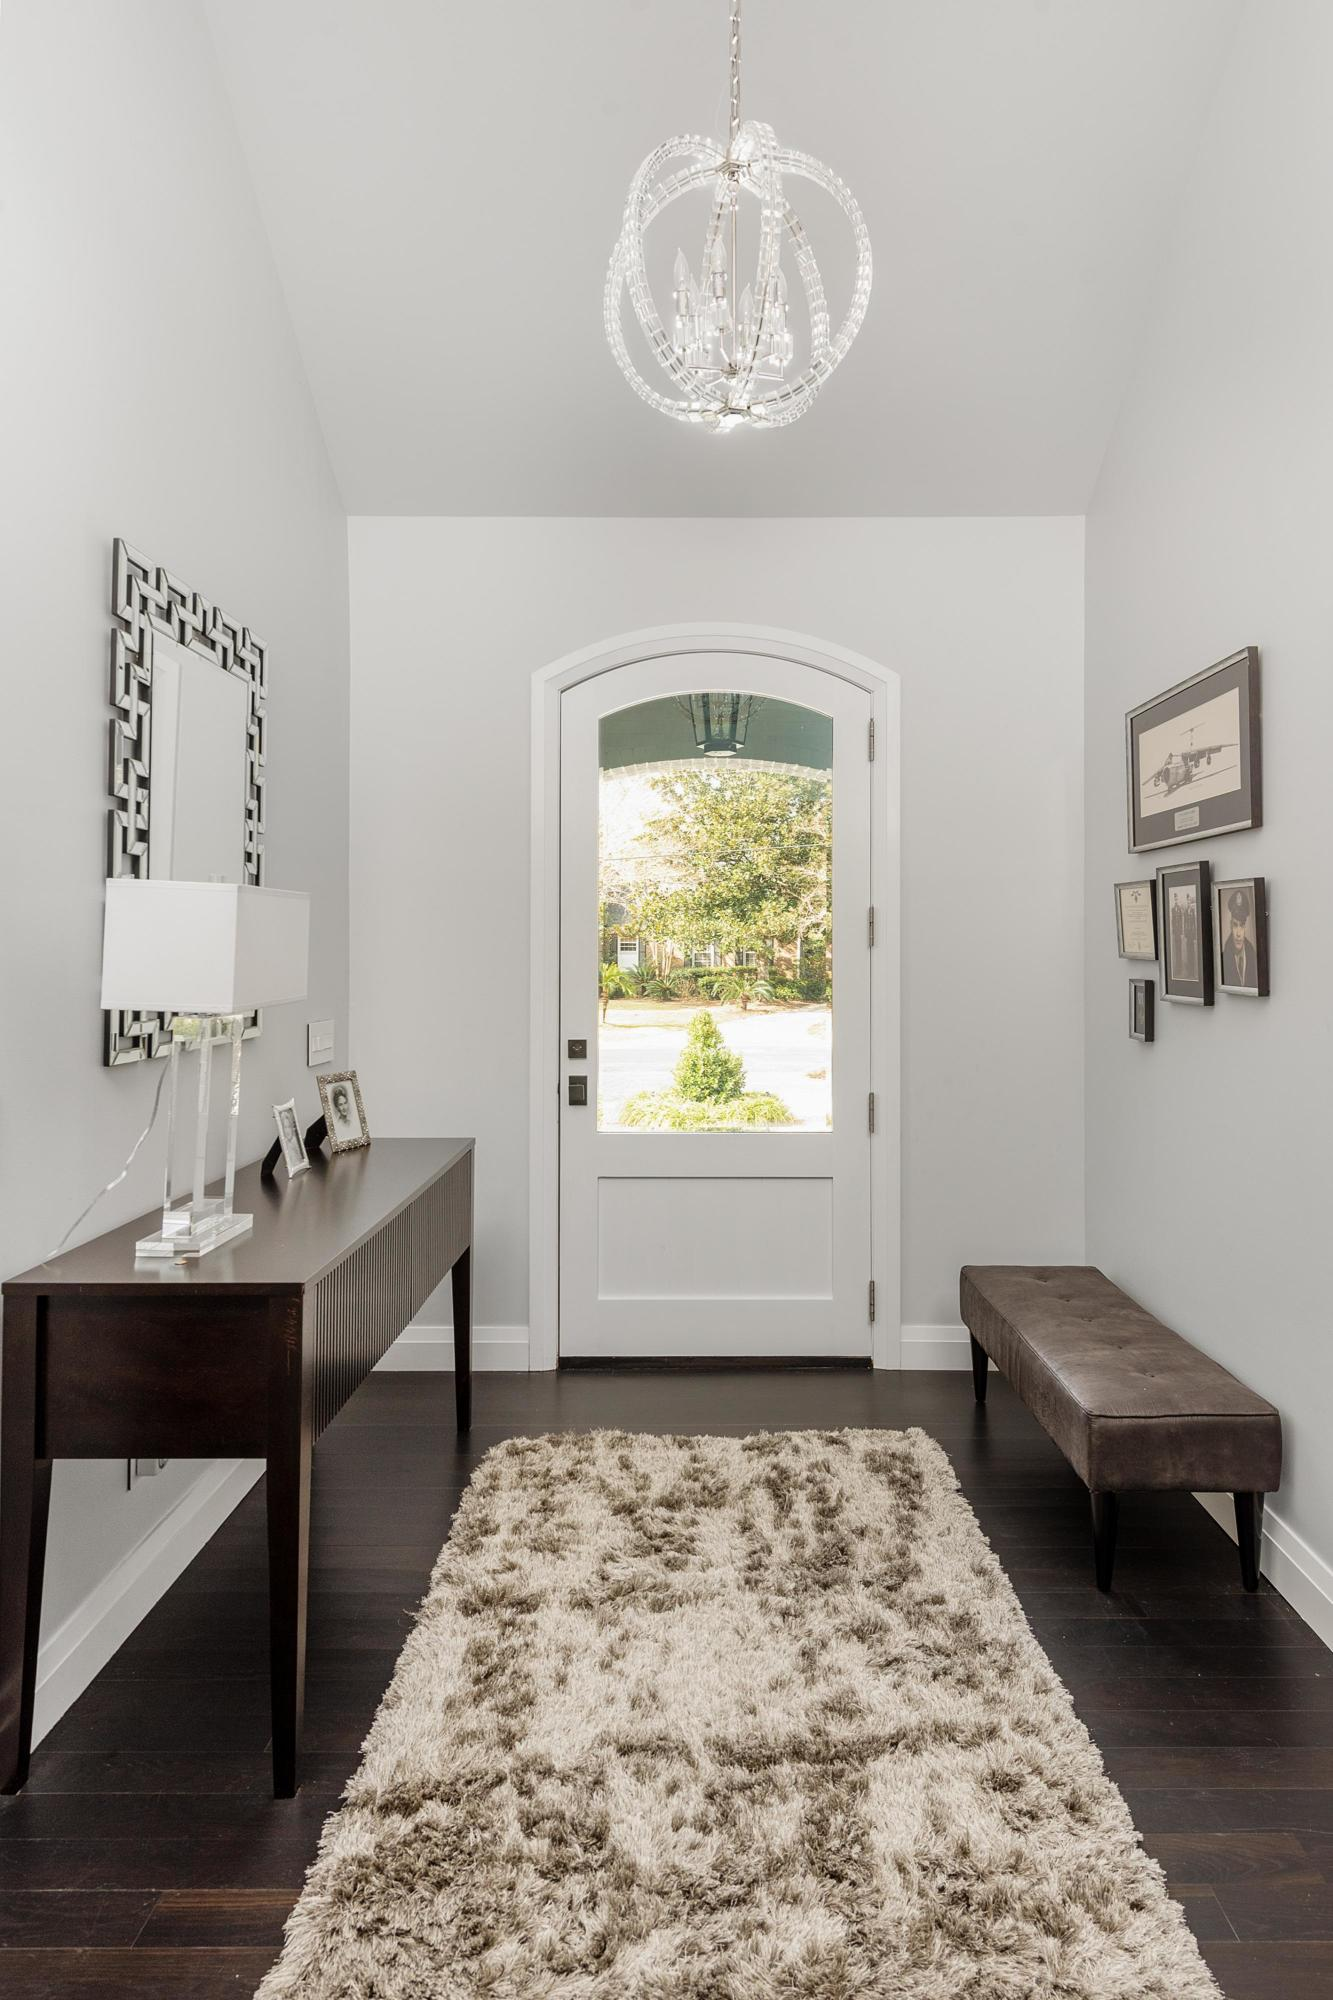 Country Club II Homes For Sale - 434 Greenbriar, Charleston, SC - 1